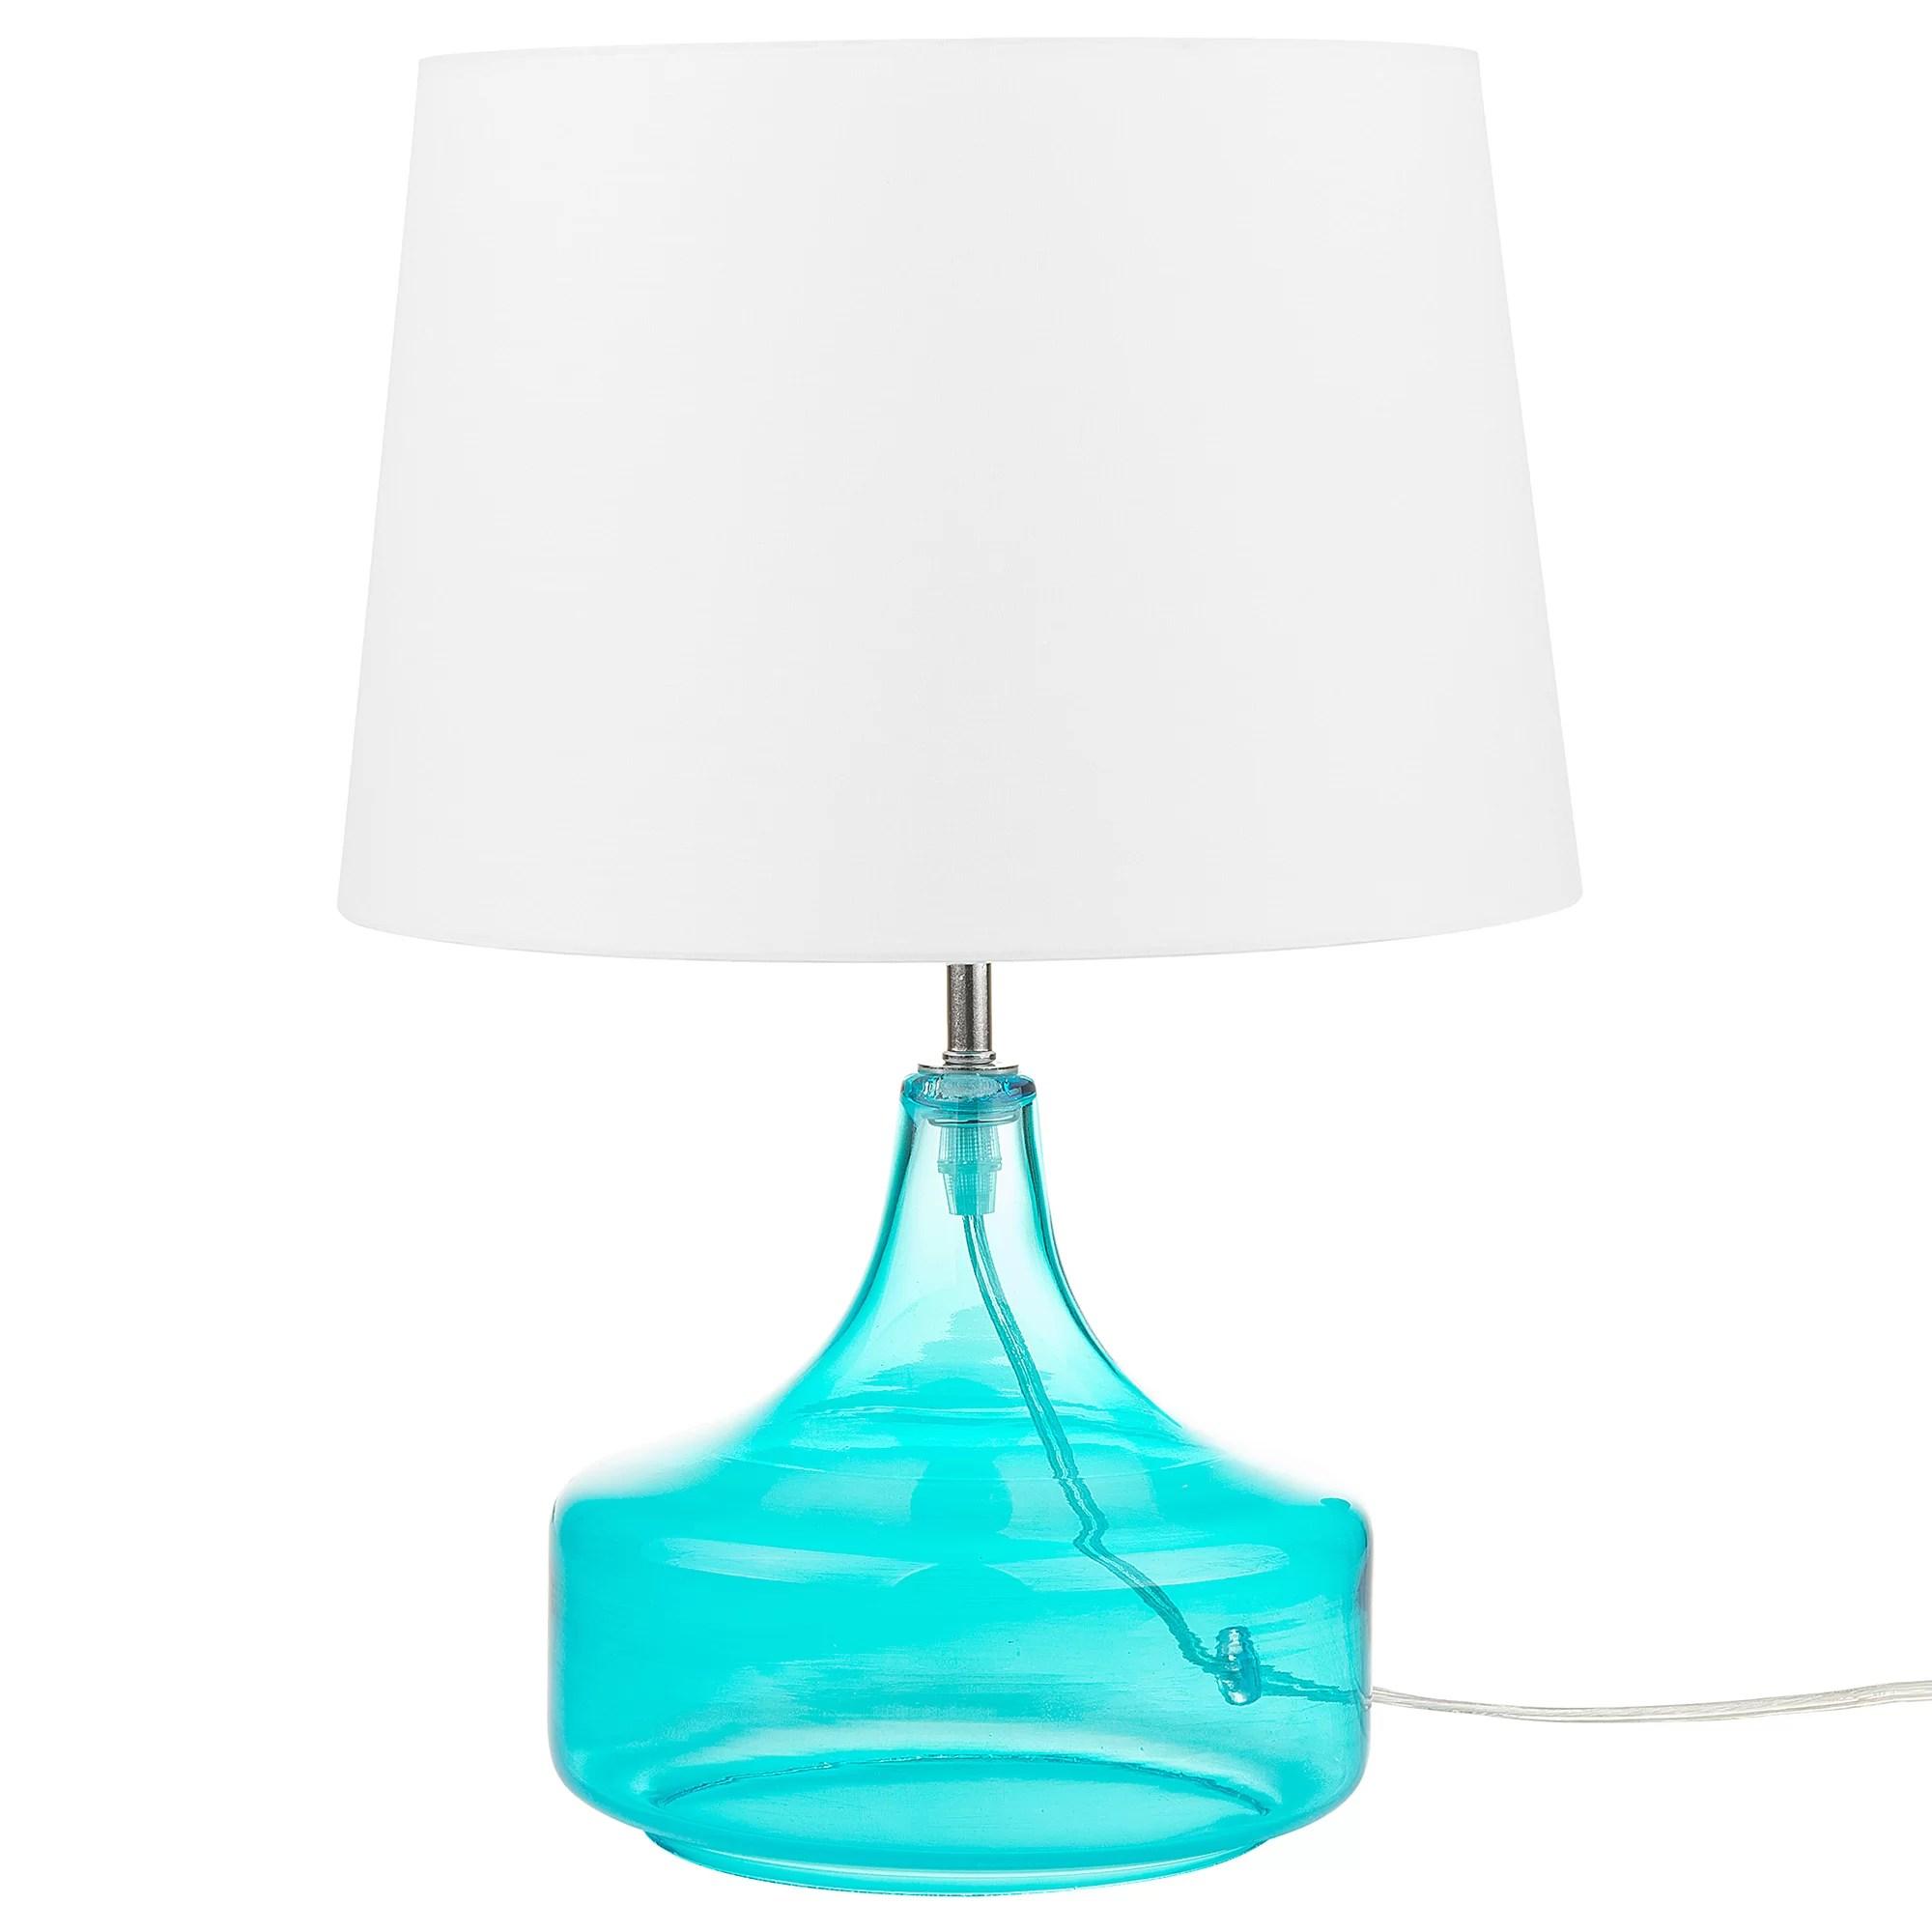 Beachcrest Home Adair 42cm Table Lamp Wayfair Co Uk